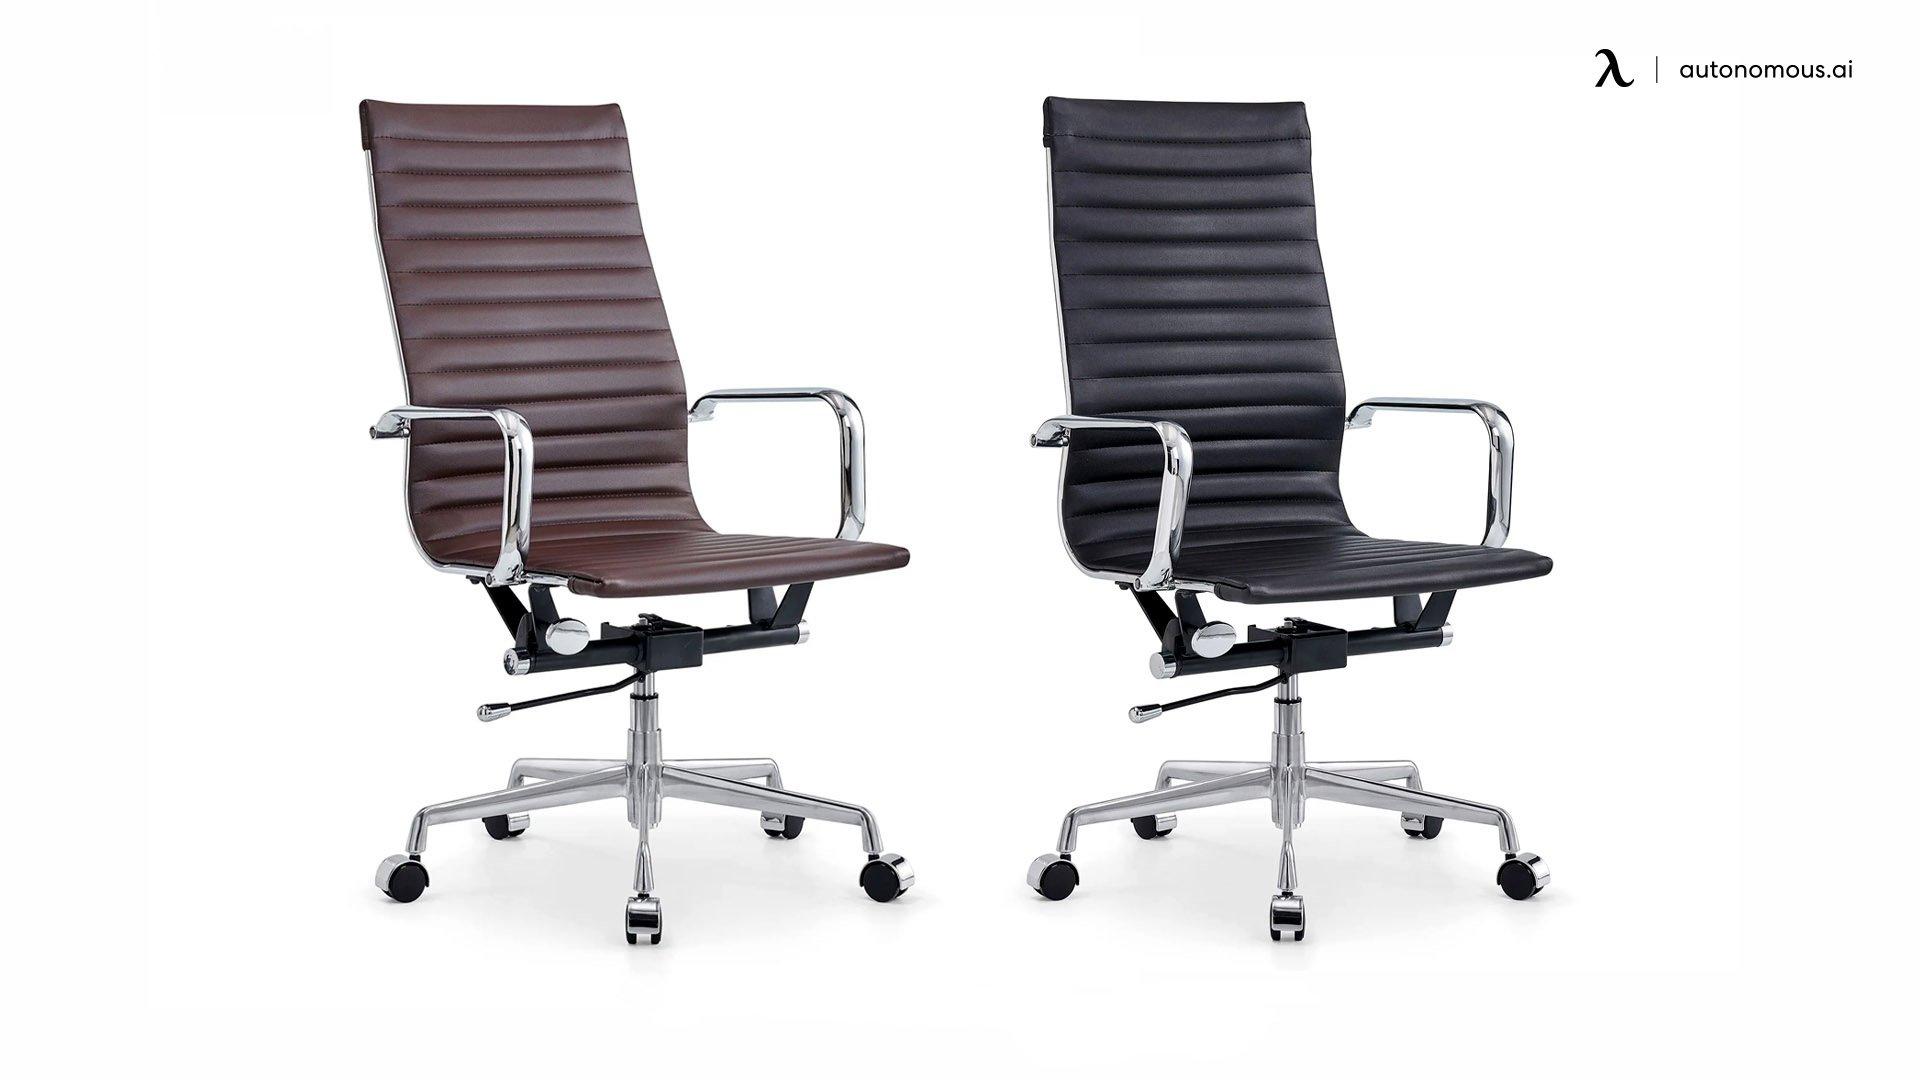 The Evey Ergonomic Task Chair by Brayden Studio